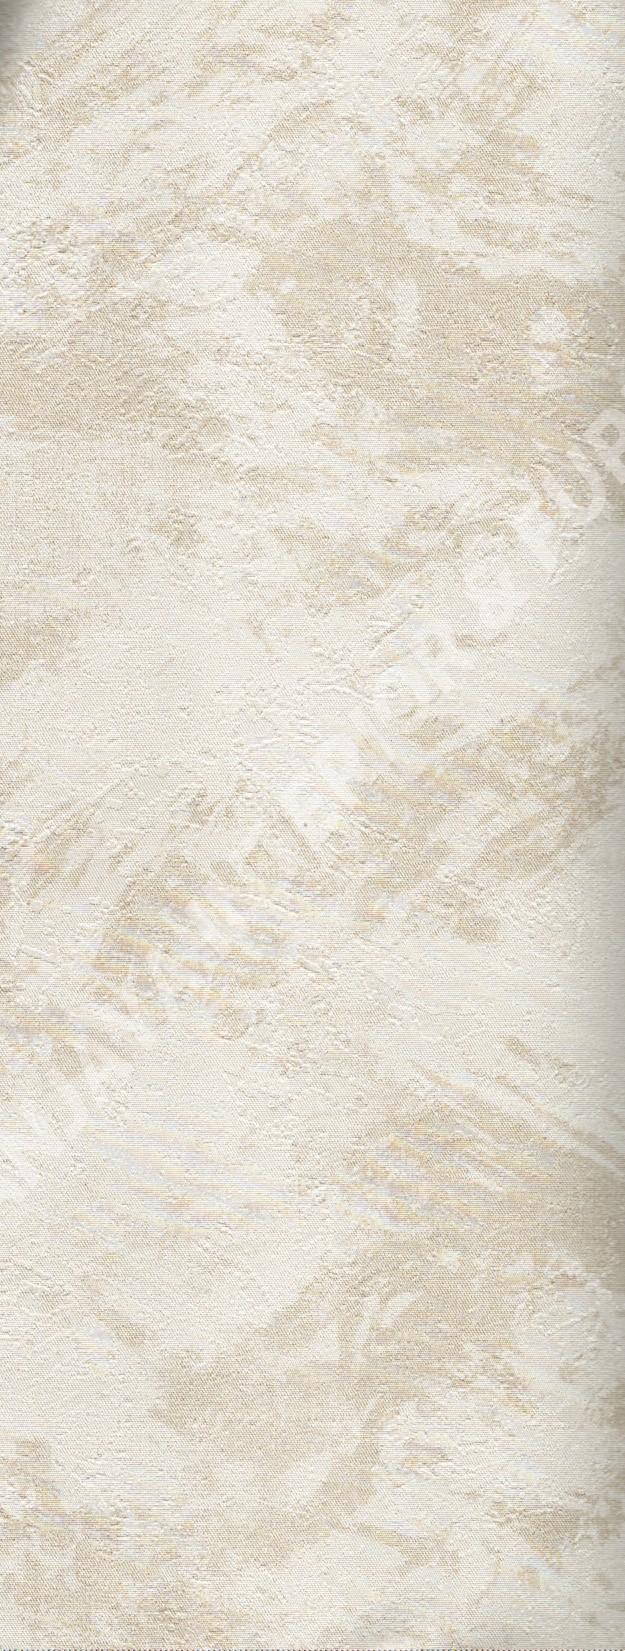 wallpaper BONITO:81081-4 corak Minimalis / Polos warna Abu-Abu